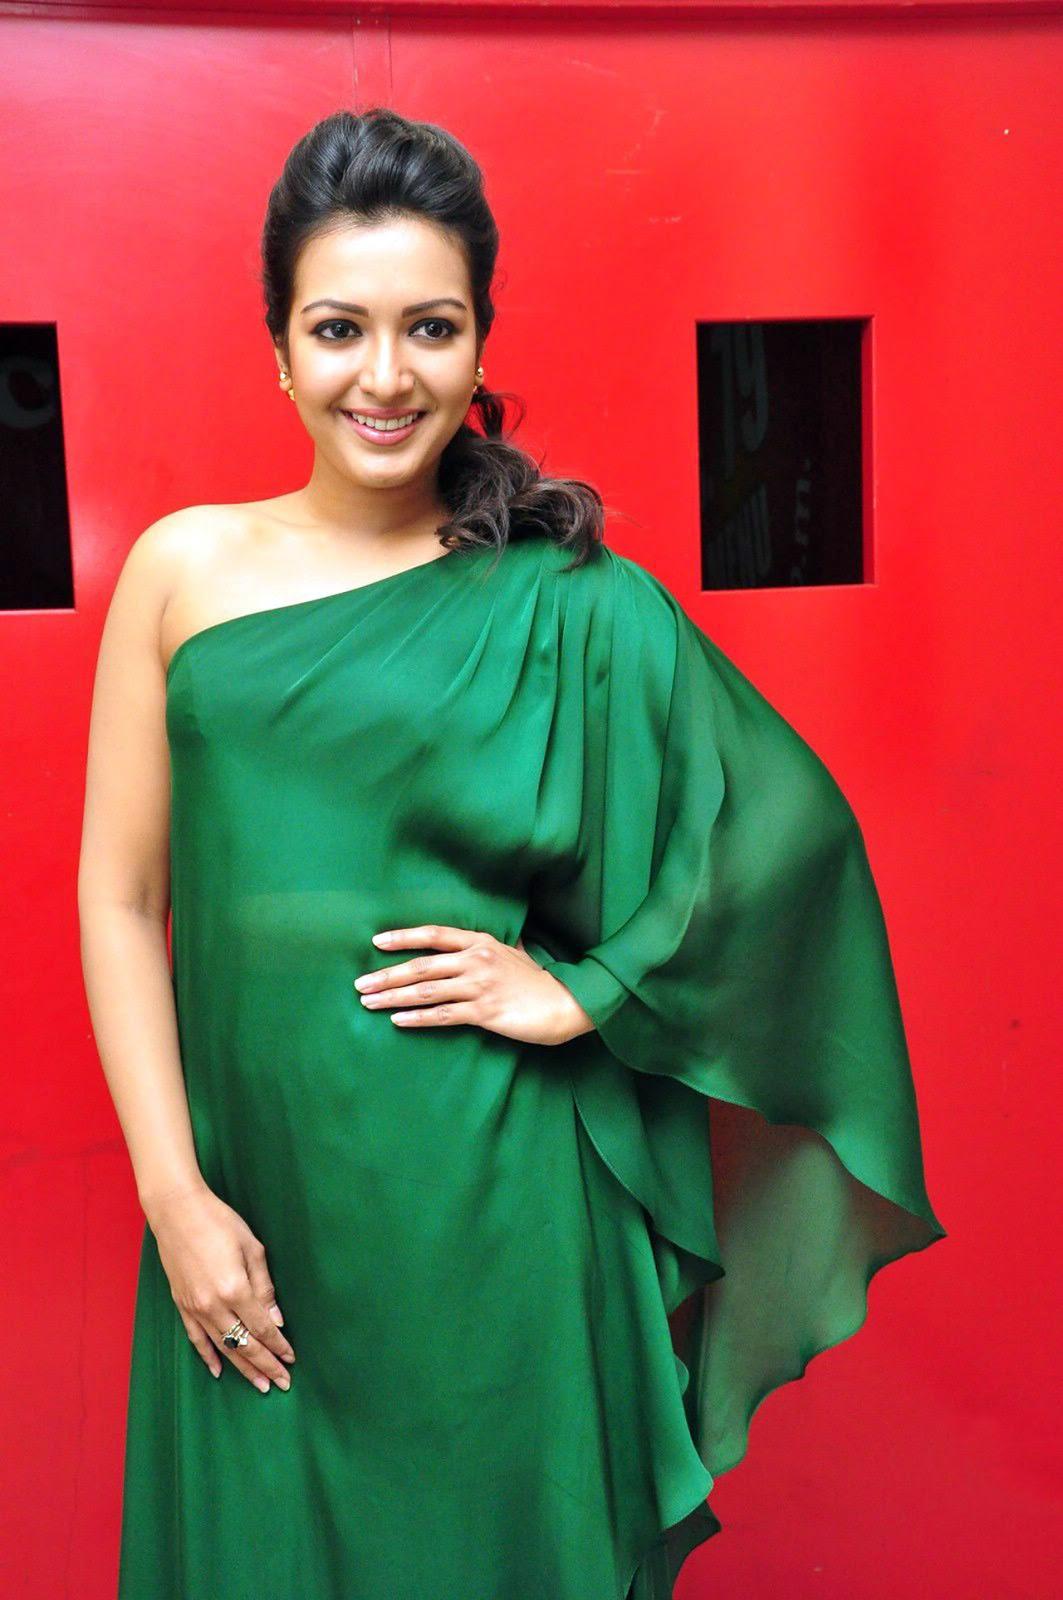 desi actress pictures catherine tresa latest hot photos